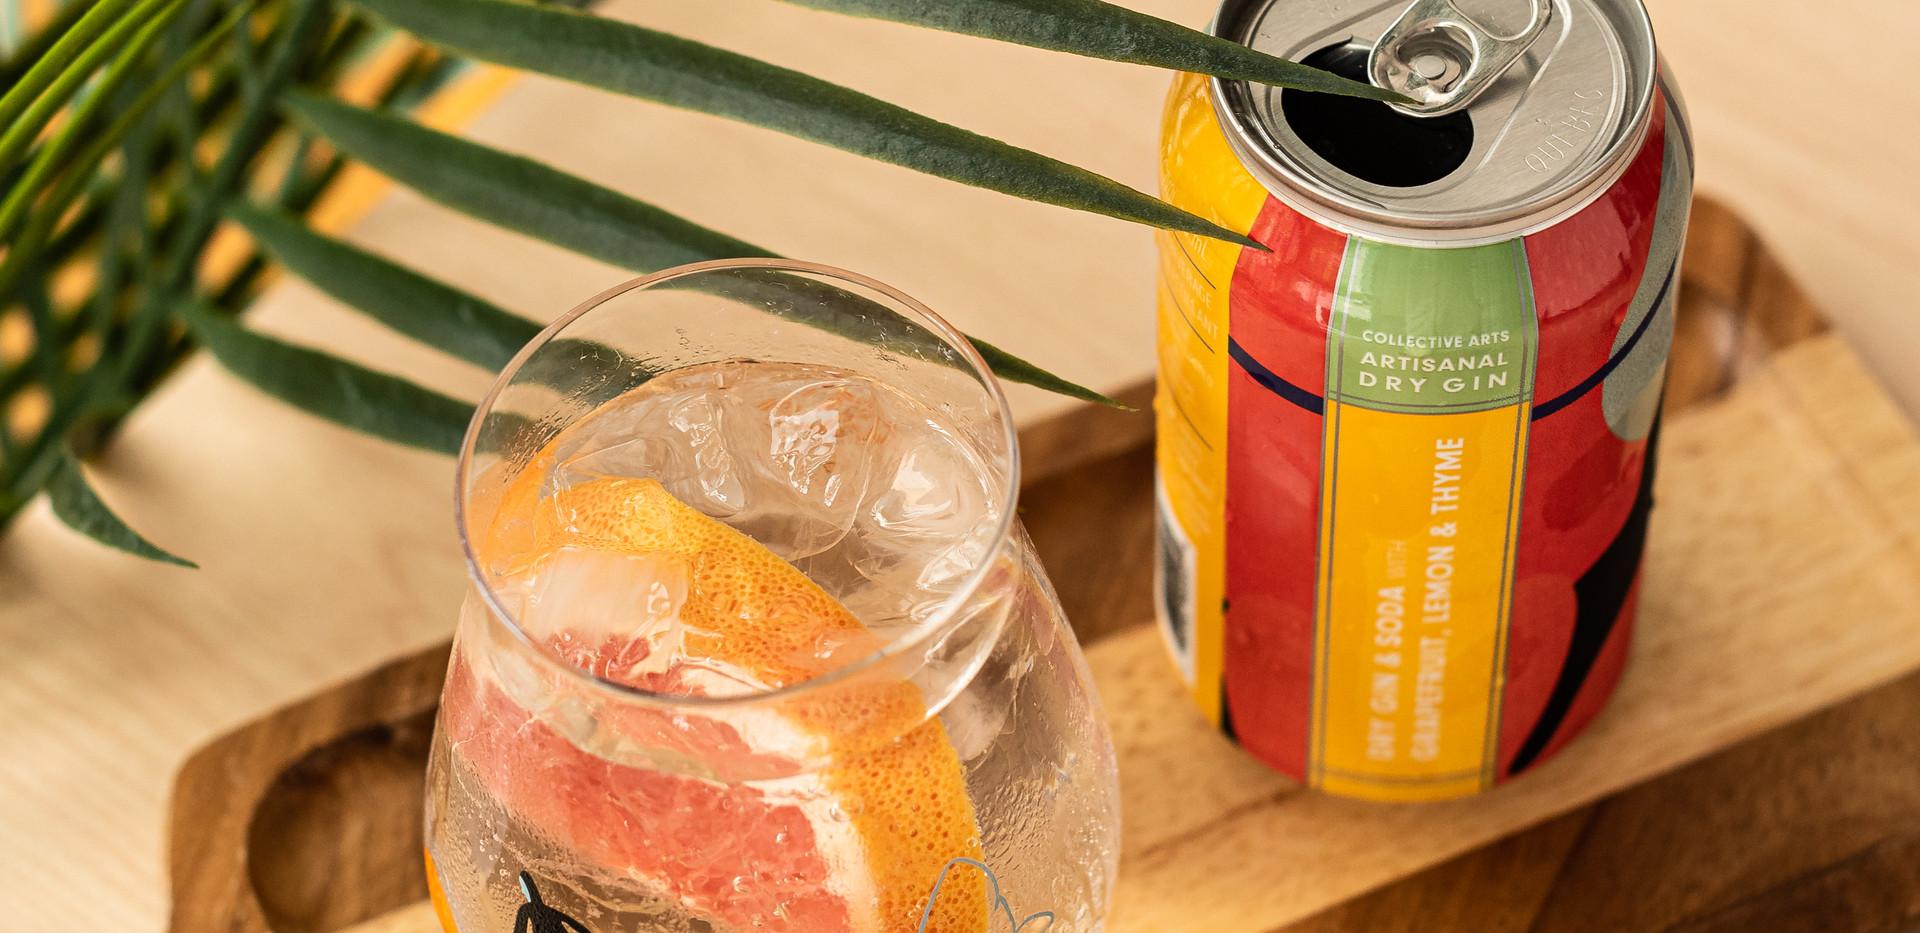 Gin-Collective Arts